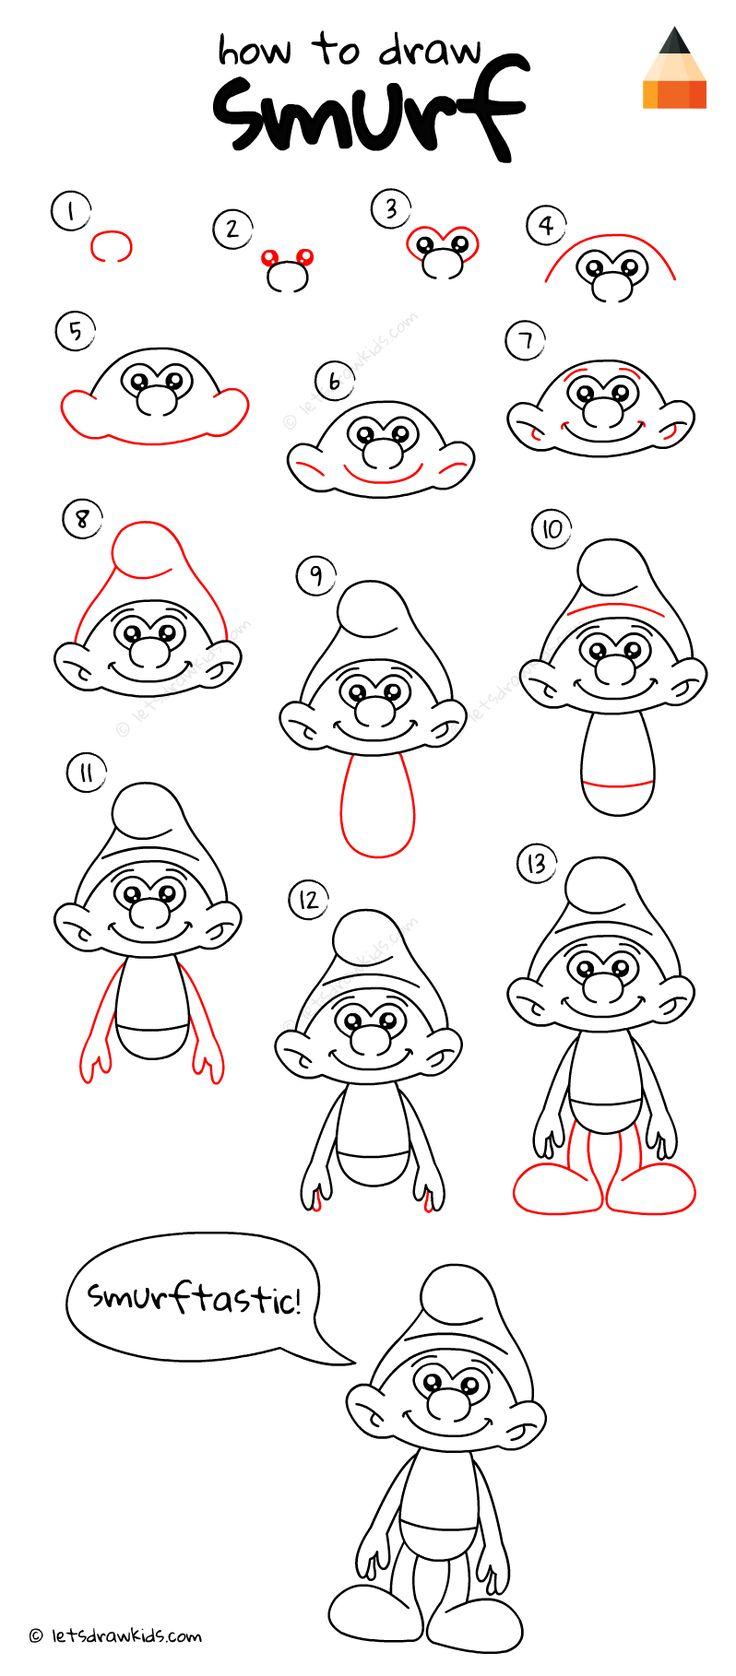 How To Draw Smurf